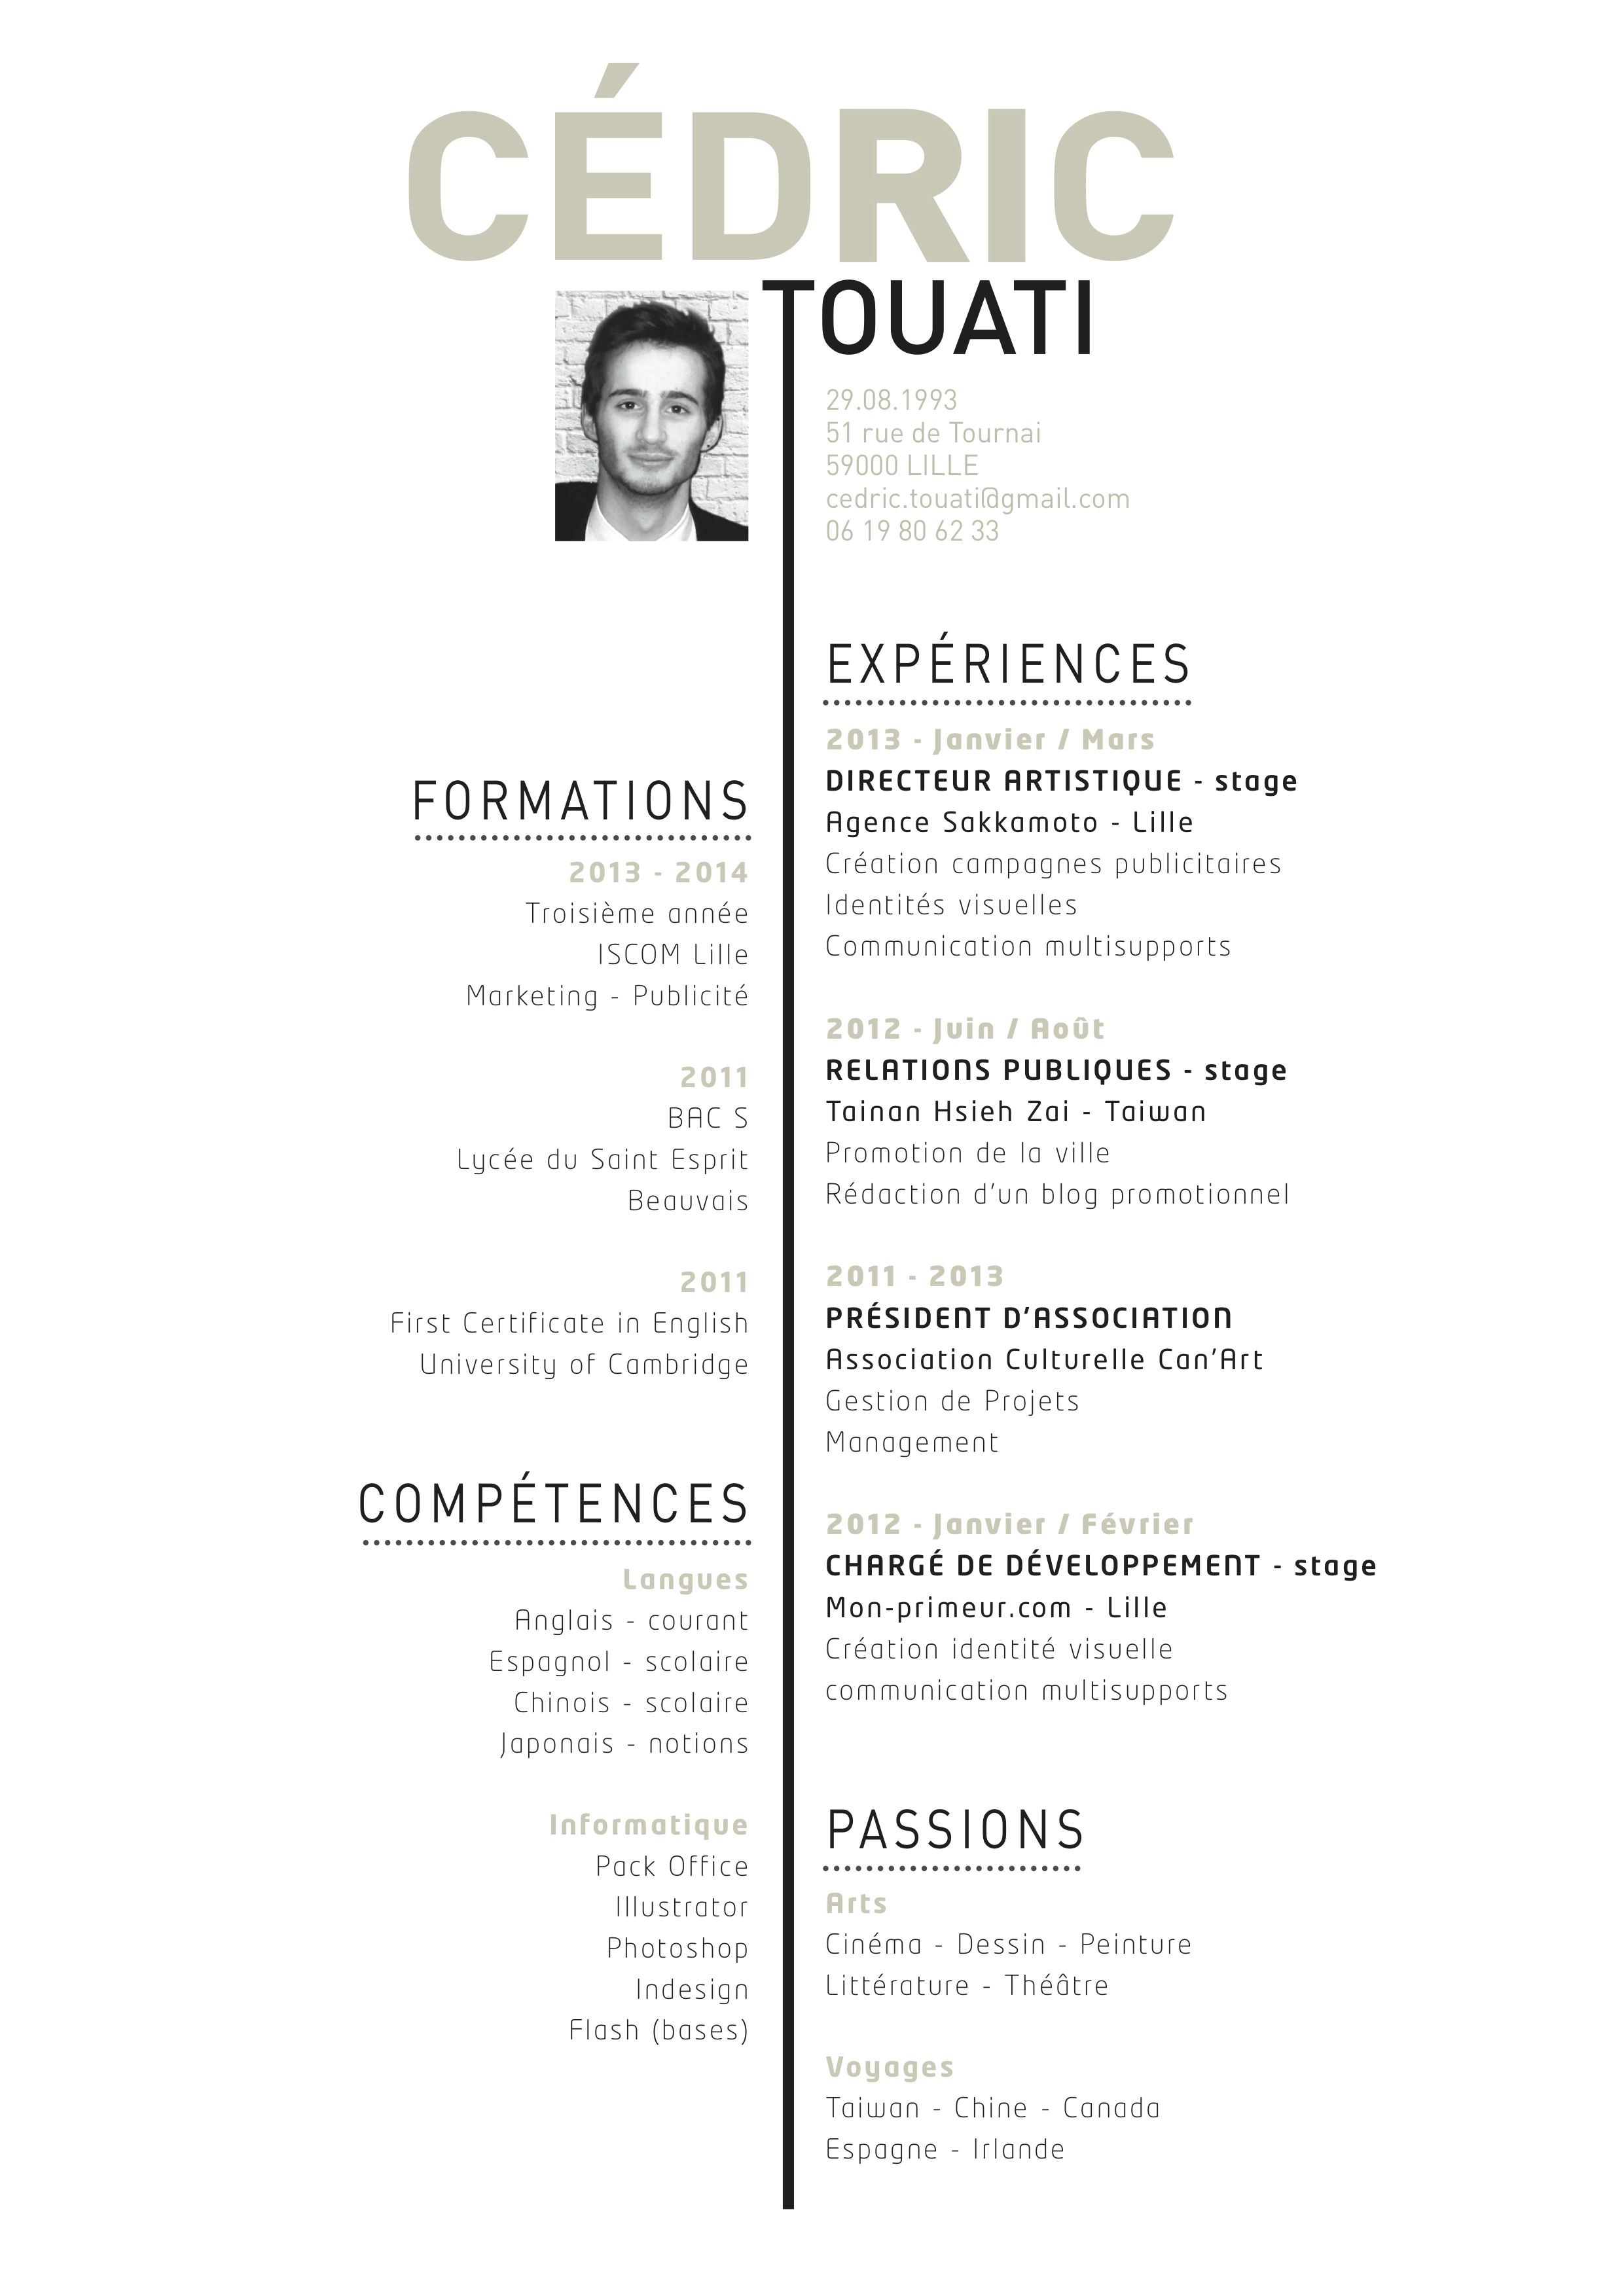 Cv Cedric Touati Art Director Graphic Design Resume Resume Design Inspiration Art Director Portfolio Creative